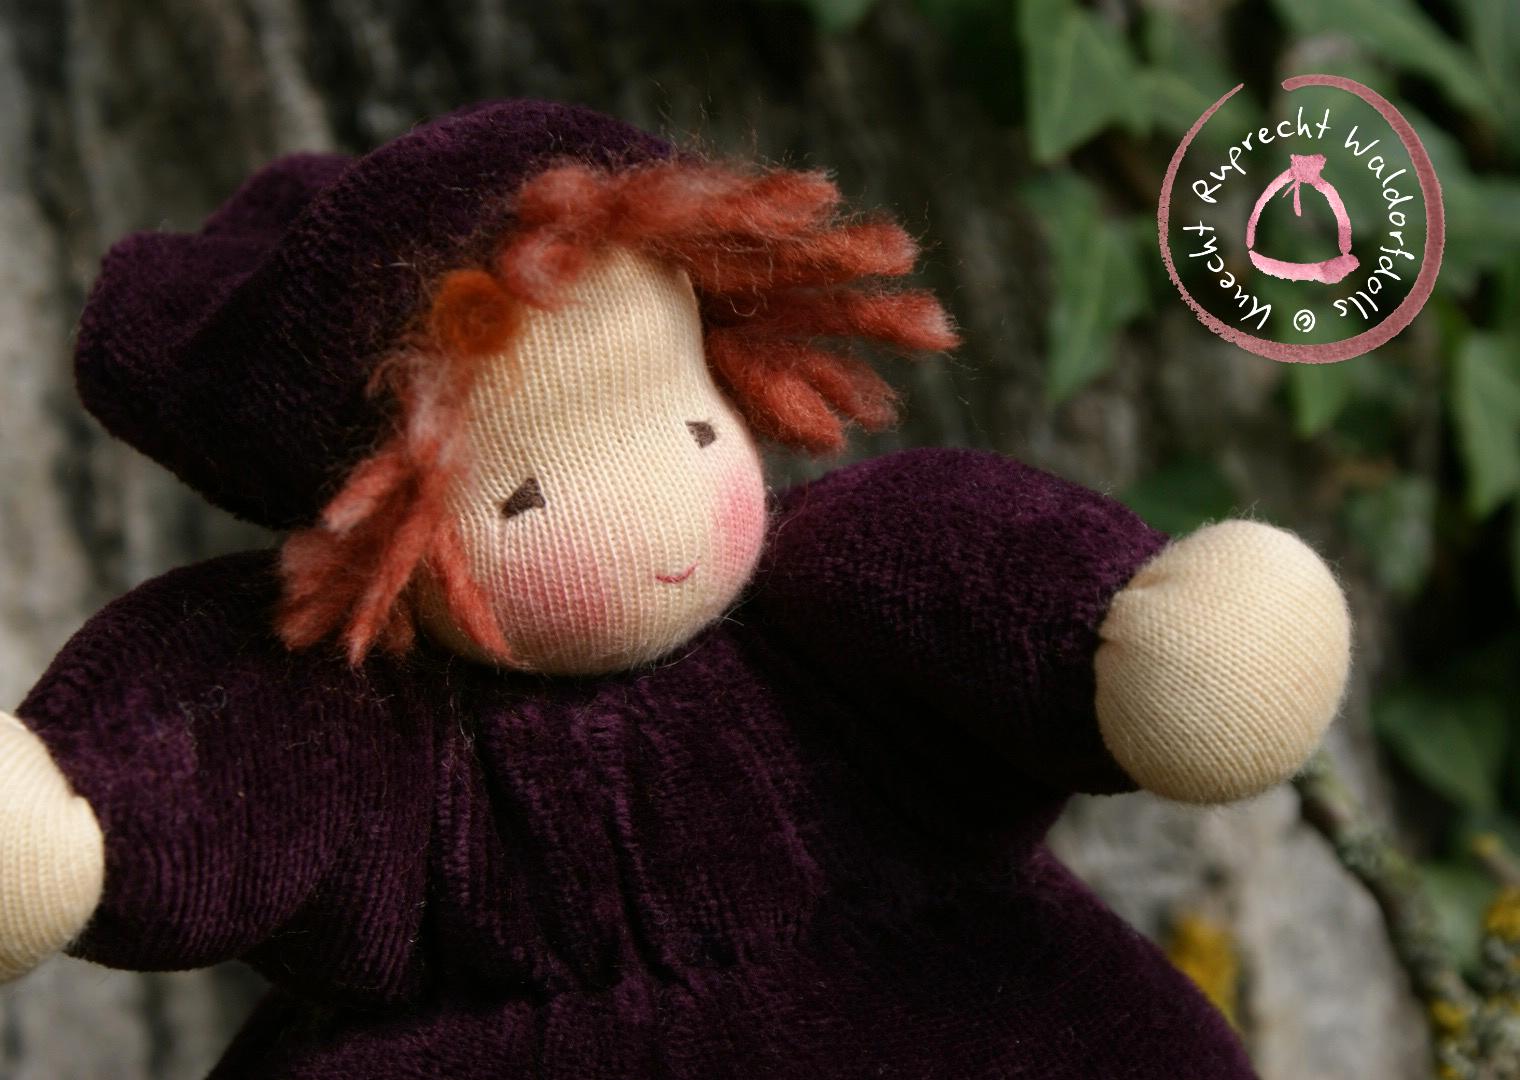 Autumn Baby - Waldorfdoll - Waldorf Doll - Babies First Doll - Cuddle Baby according to waldorf peda